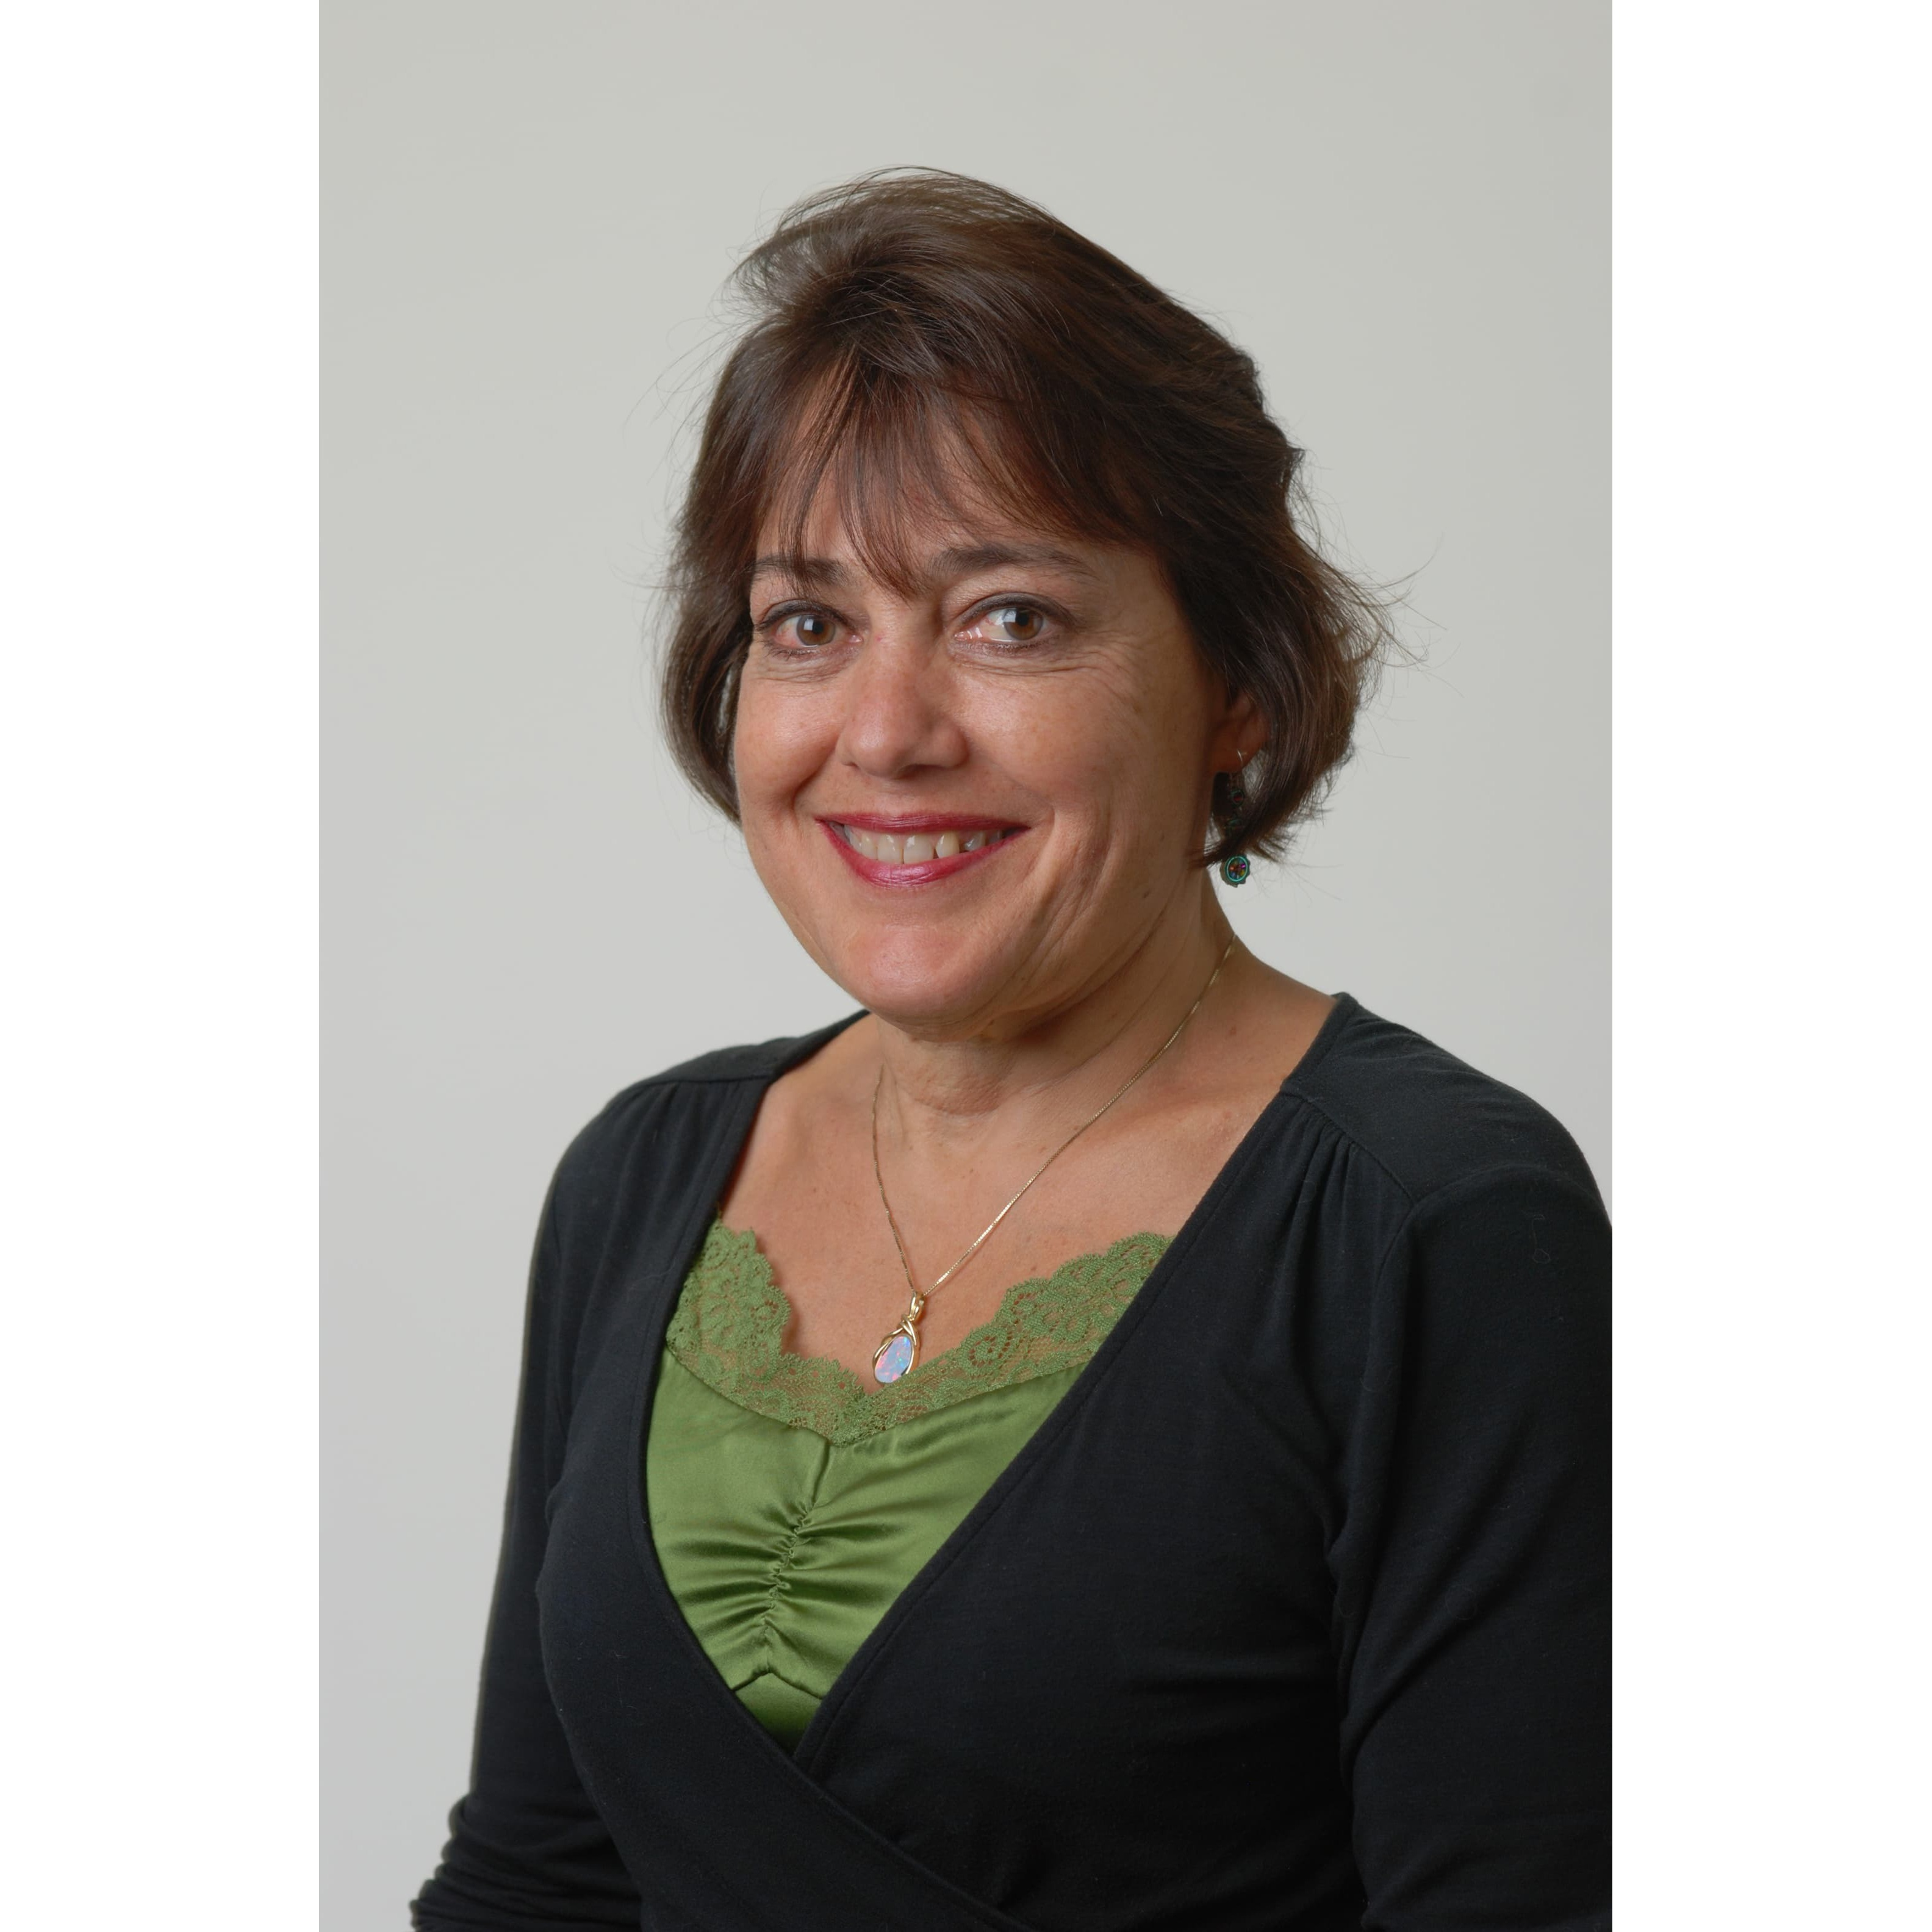 Erica Eugster